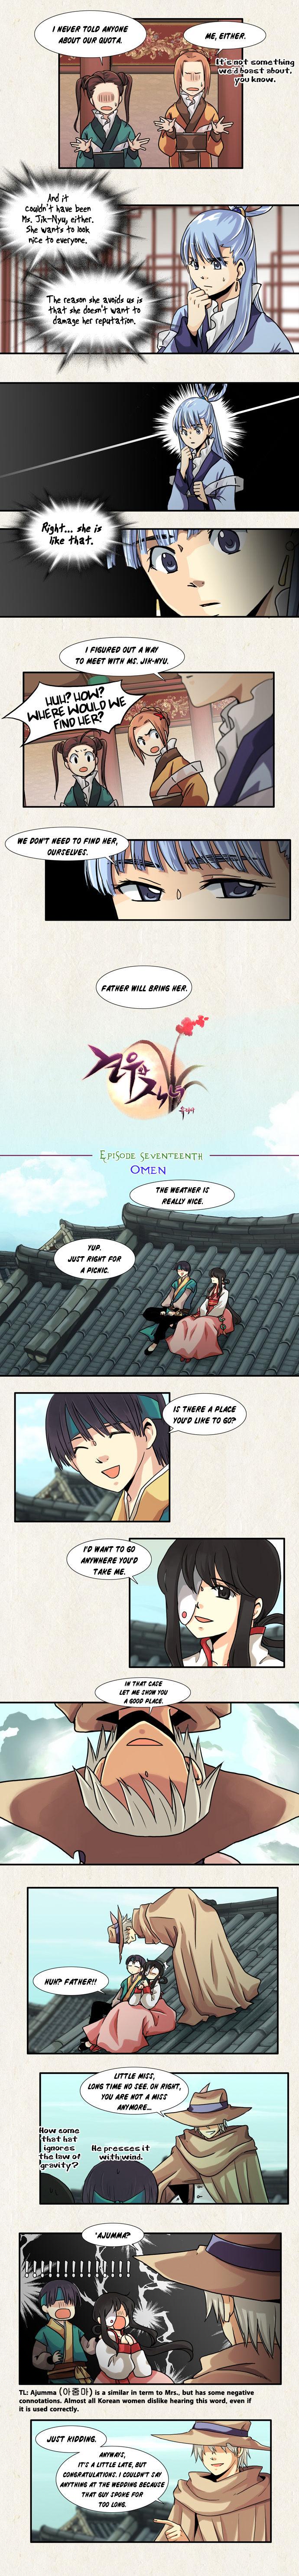 Gyon Woo Jik Nyu 17 Page 2